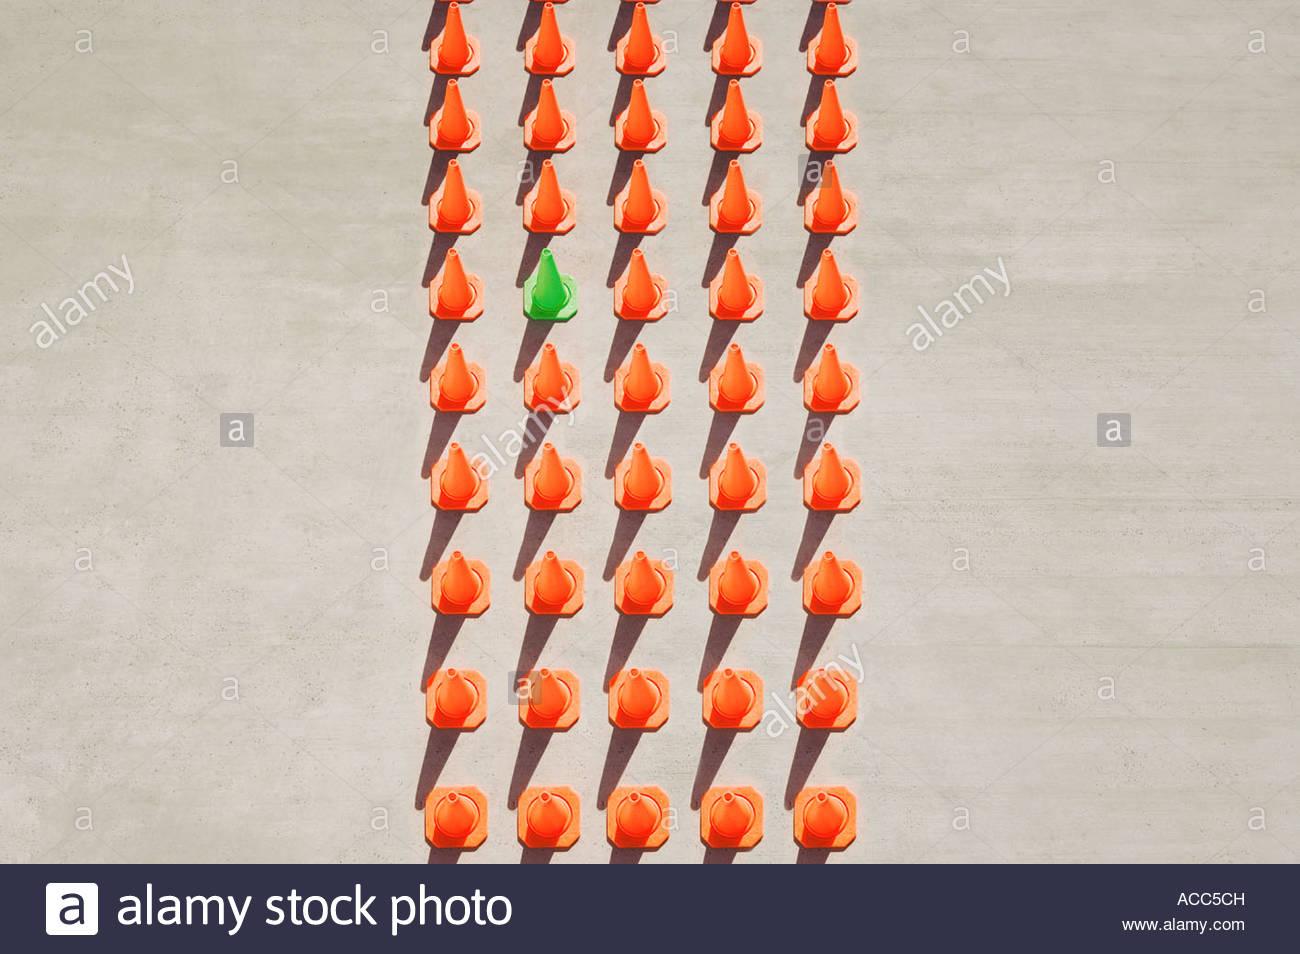 One green pylon amid forty-four orange pylons - Stock Image